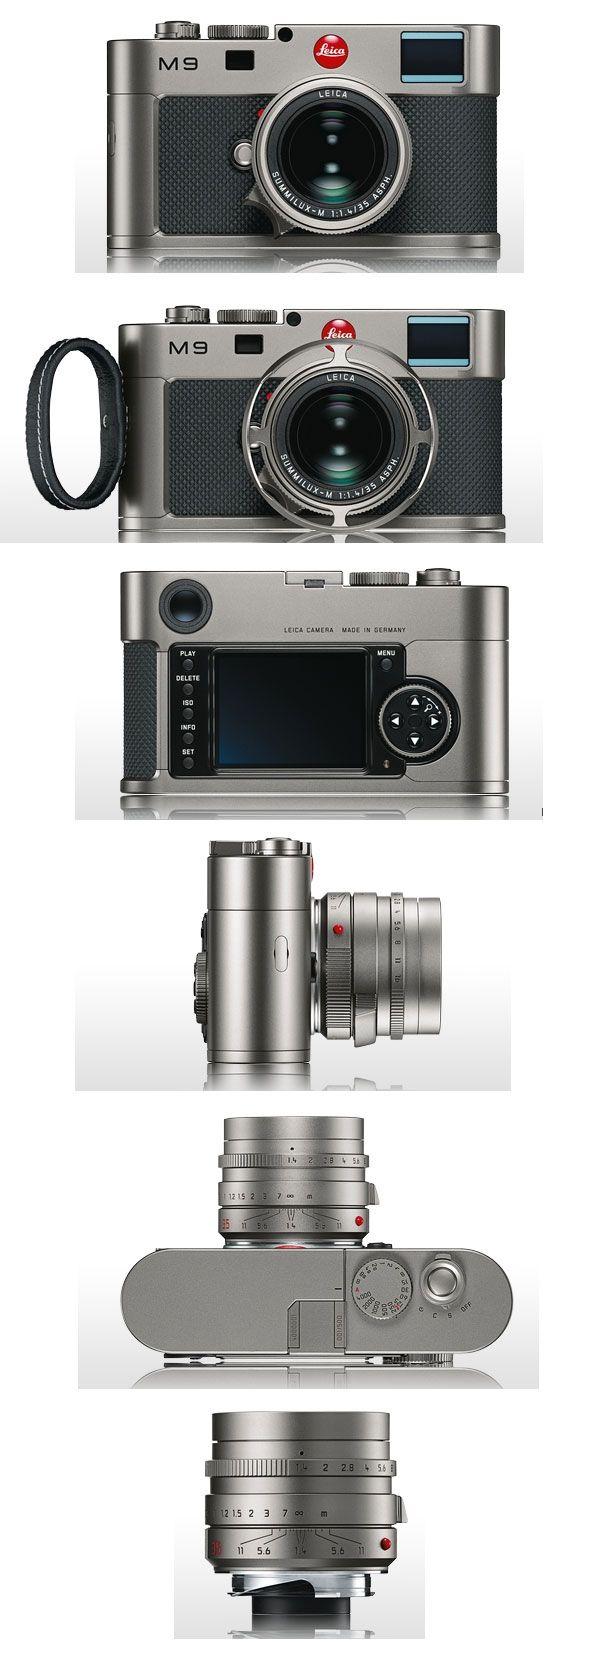 Leica M9 Titanium Edition  designed by Walter de'Silva